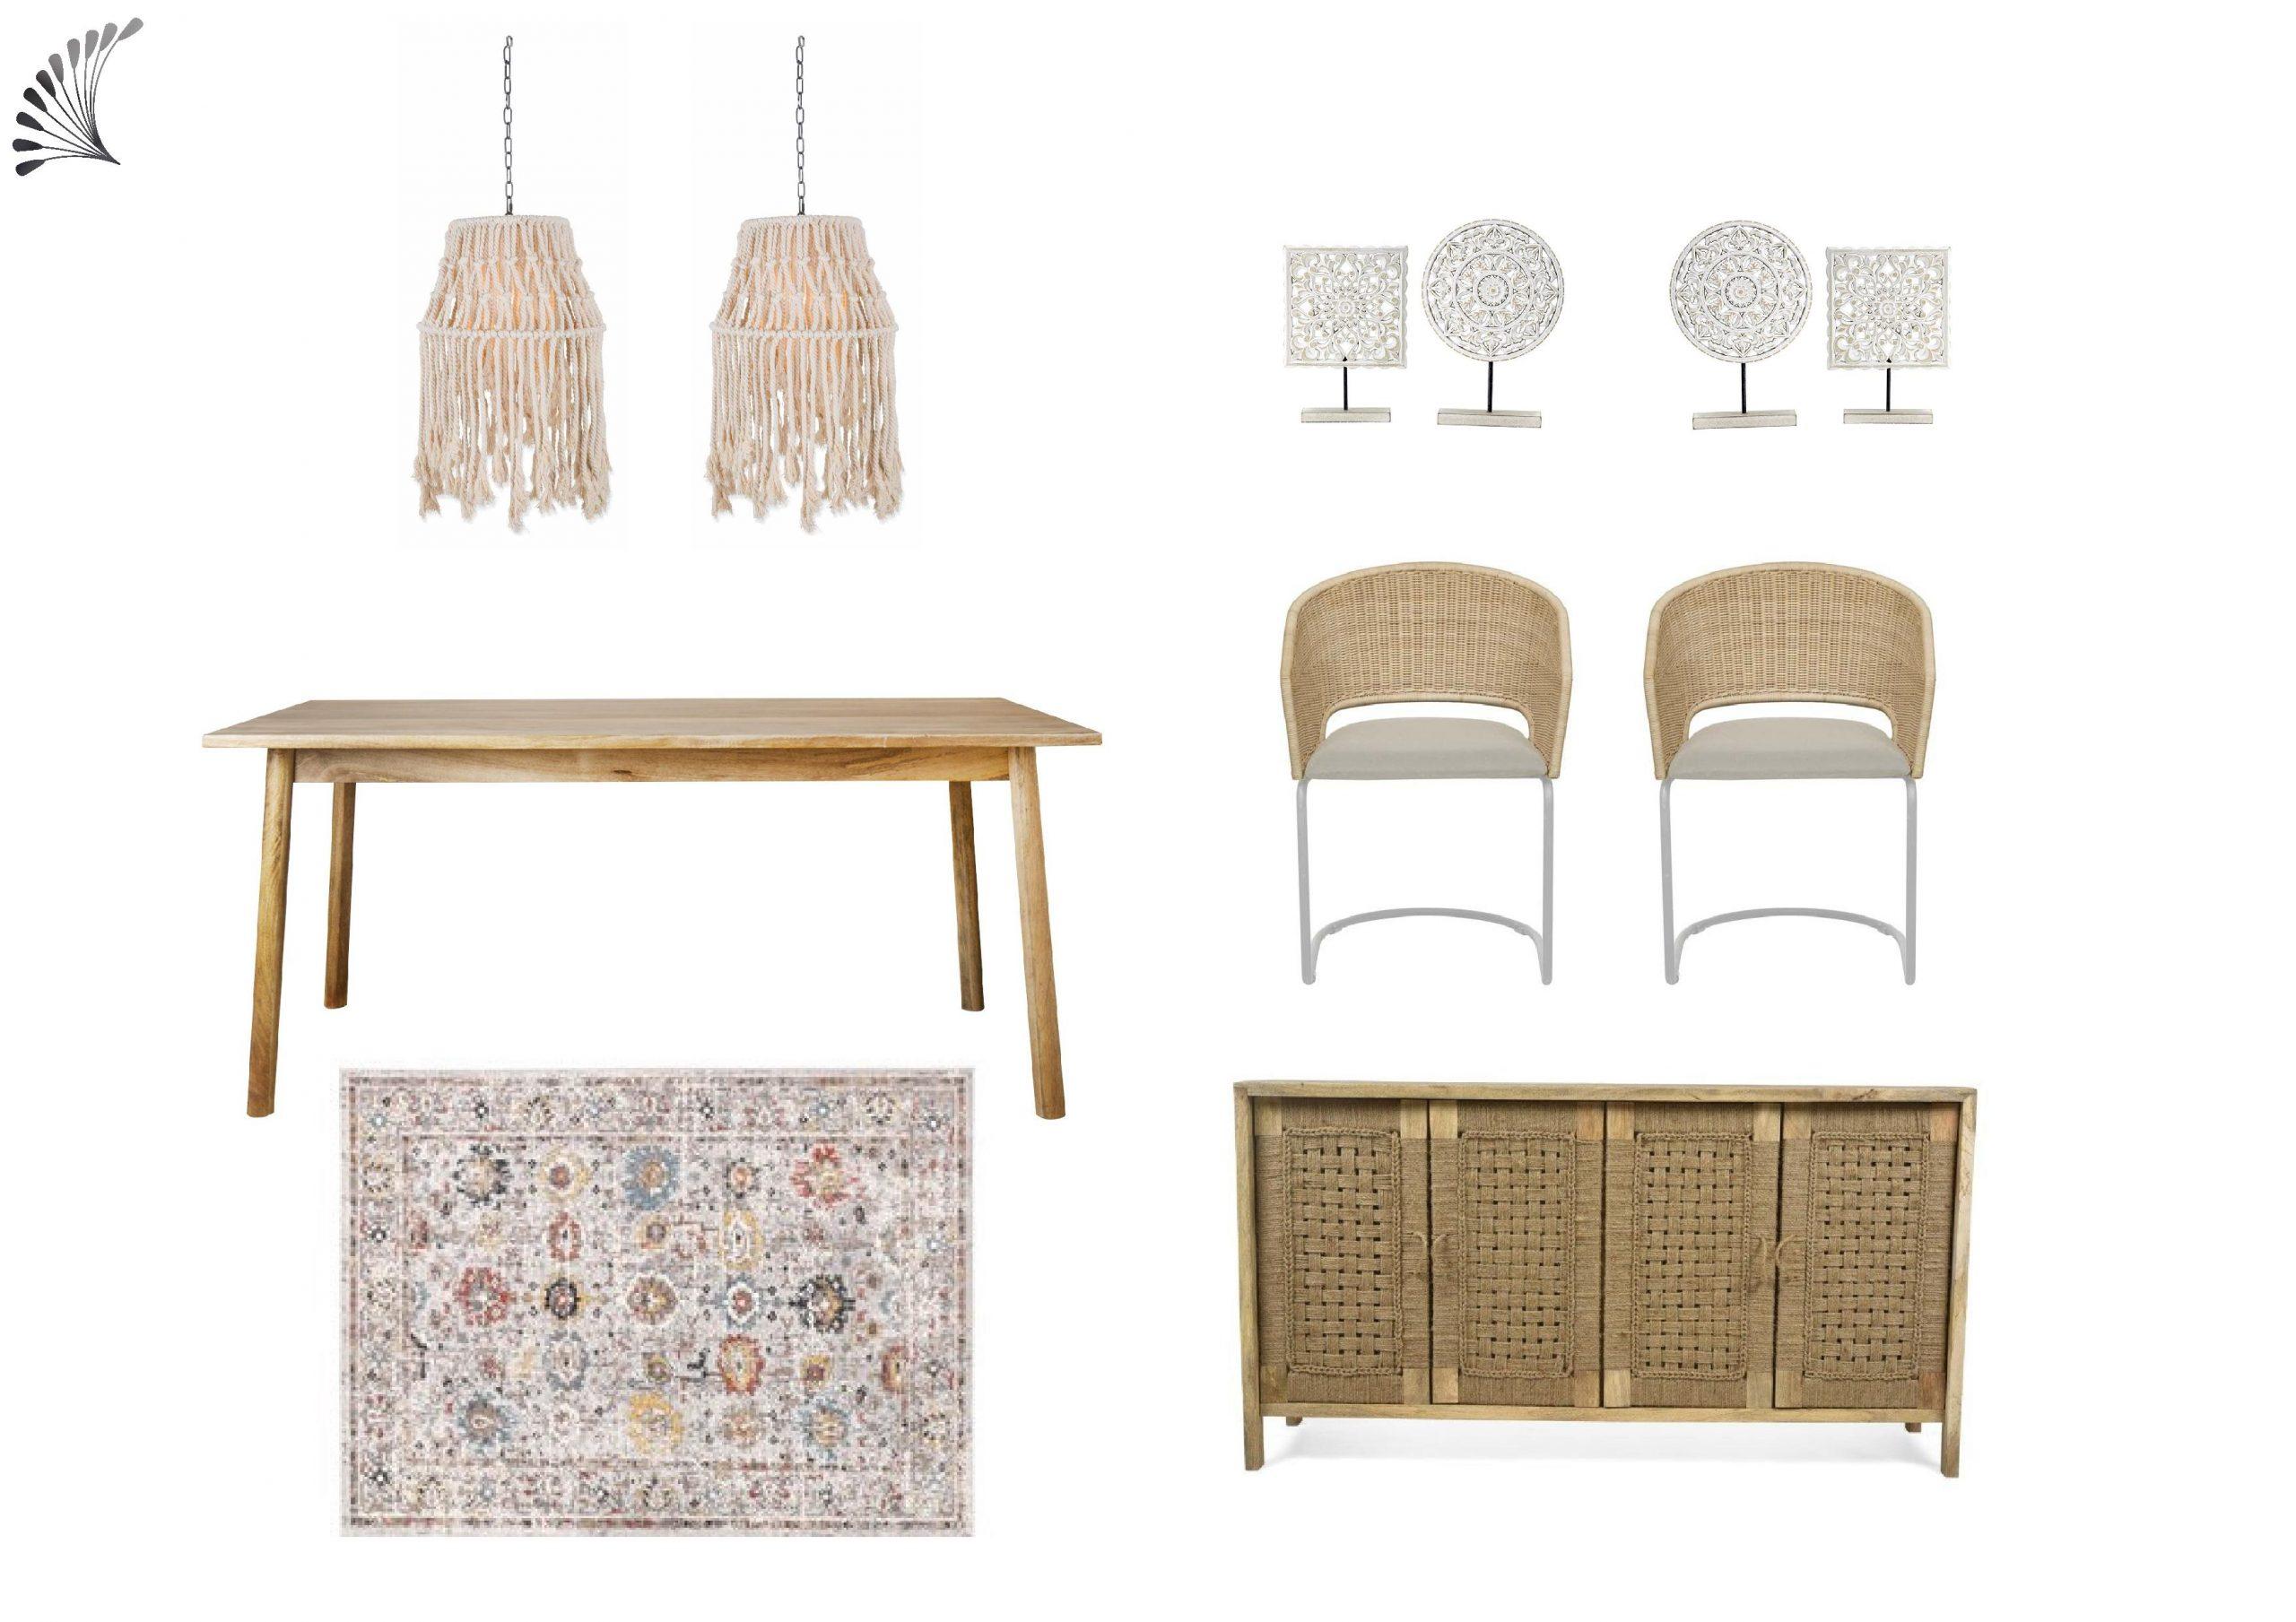 Boho Dining Room Furniture Package